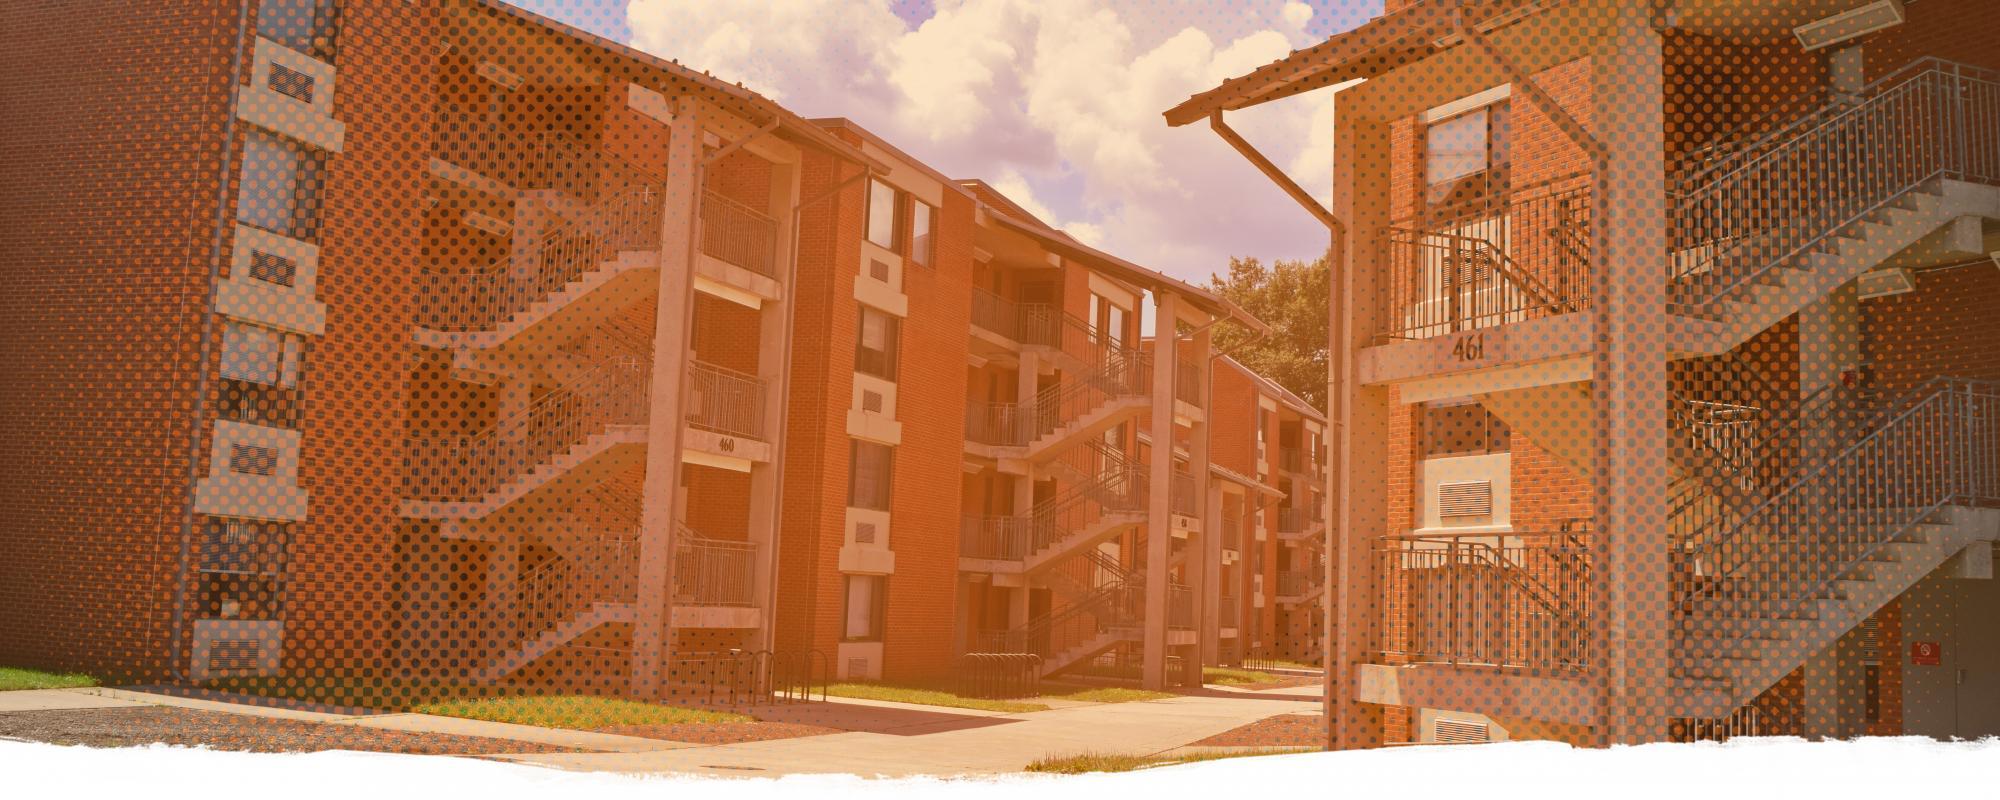 Lambeth Field Apartments